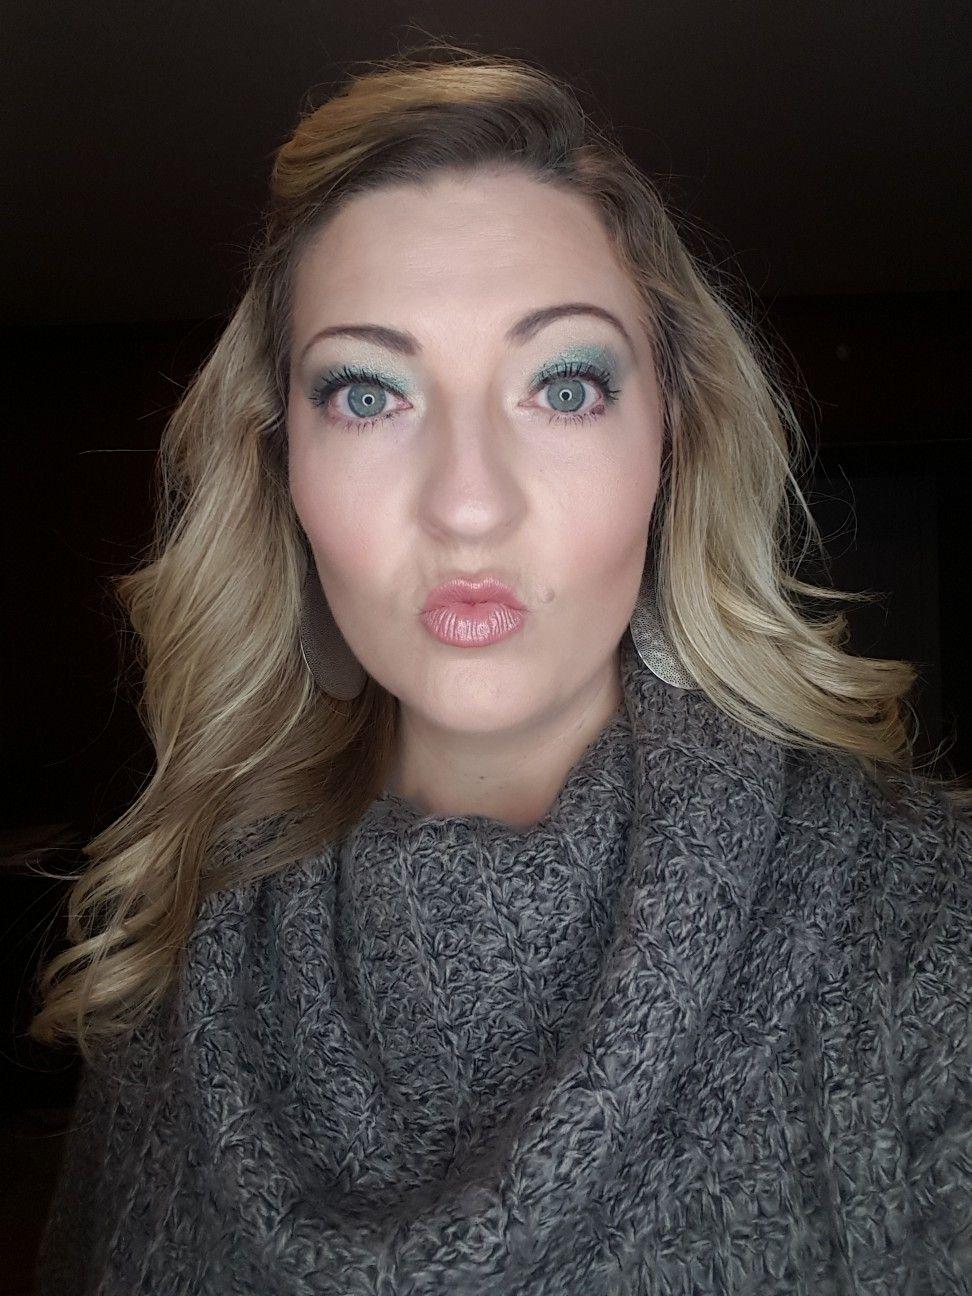 Dignified eye pigments!! lovegreen sassylashdoc Eye